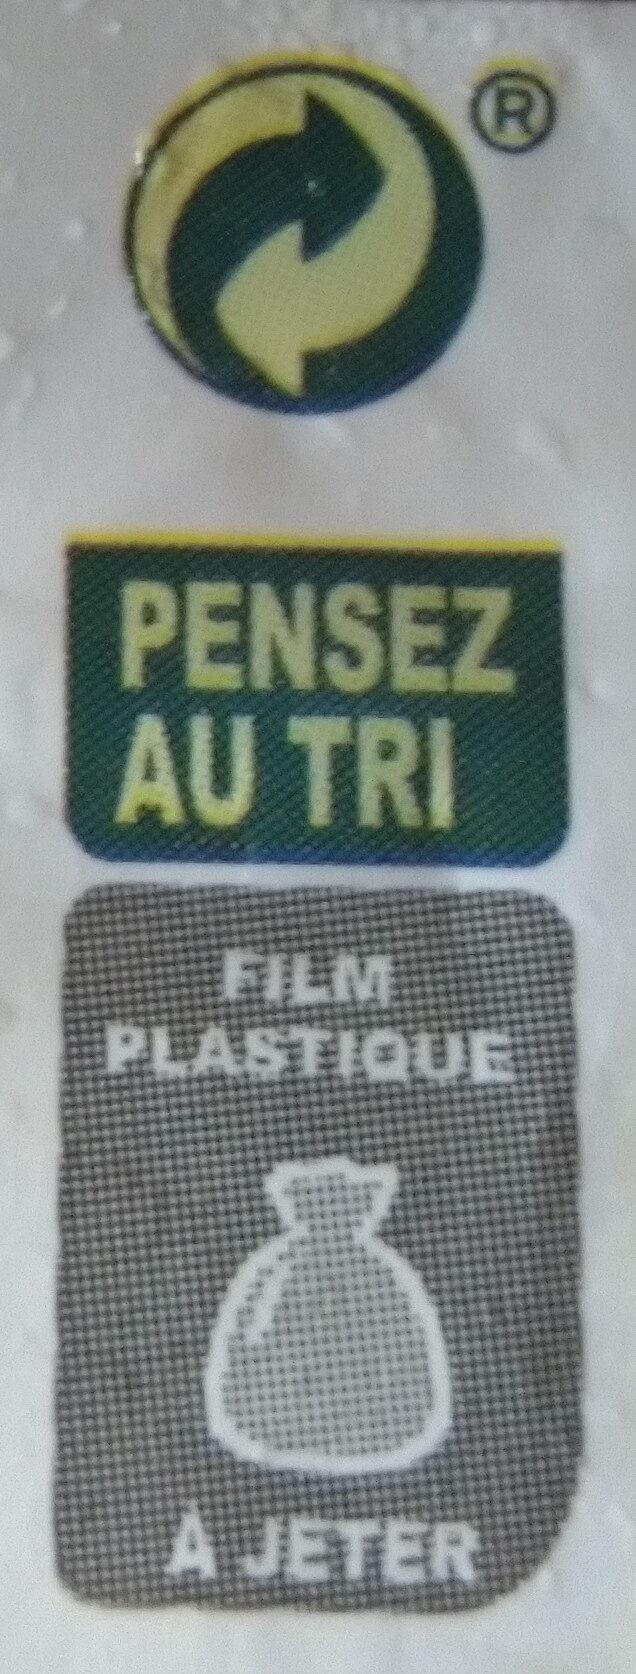 Rissolées du sud ouest - Recyclinginstructies en / of verpakkingsinformatie - fr